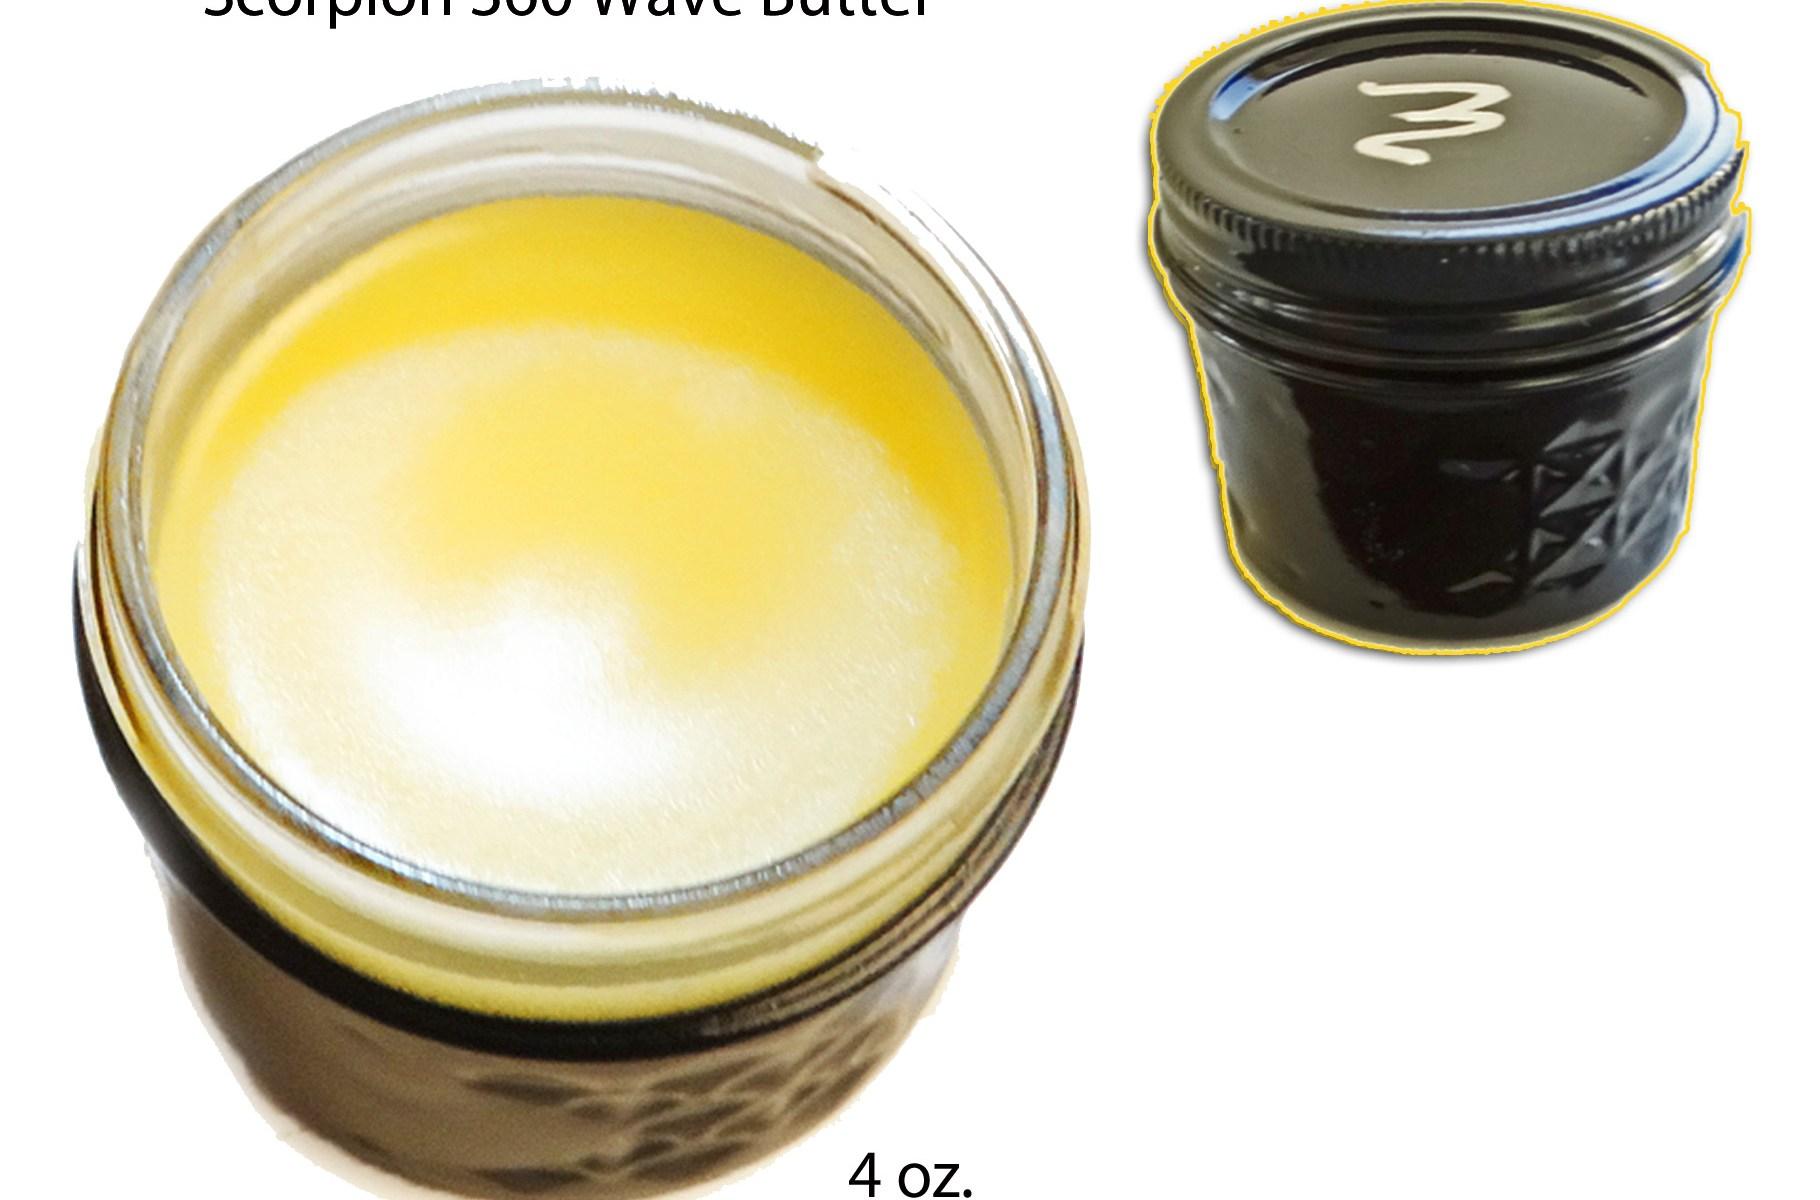 4 oz. Scorpion 360 Wave Butter